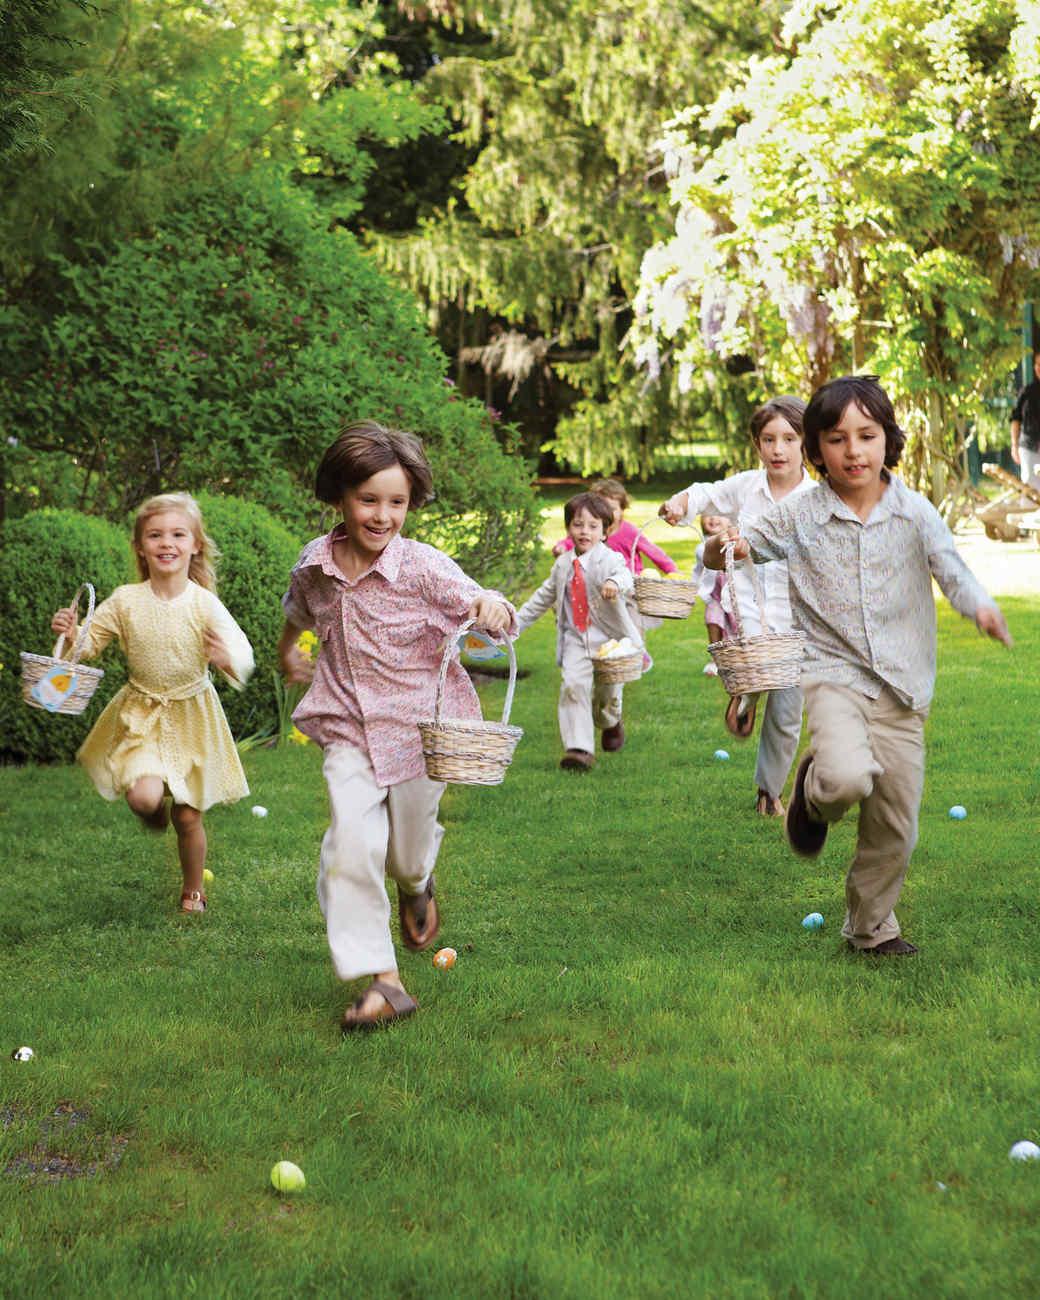 mld105925_0411_egghunt_912_kids_running.jpg